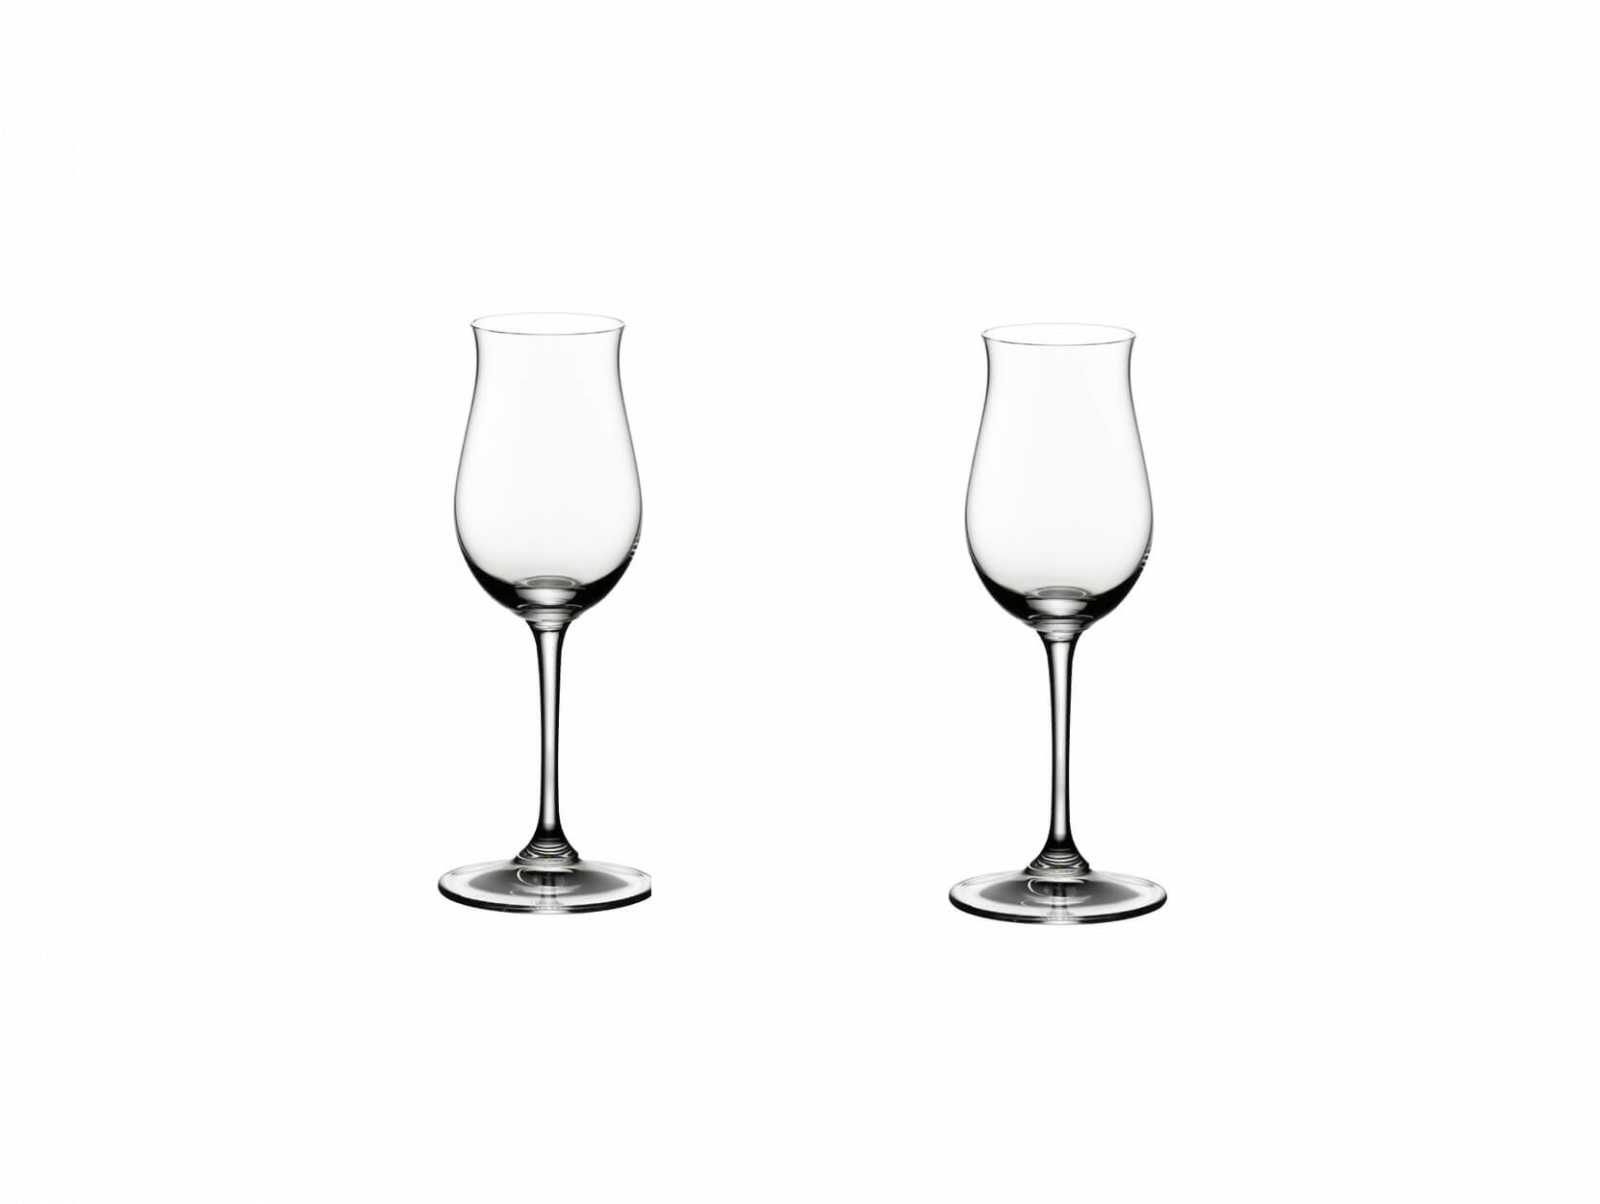 Онлайн каталог PROMENU: Набор бокалов для коньяка Riedel VINUM, объем 0,17 л, прозрачный, 2 штуки                               6416/71-1